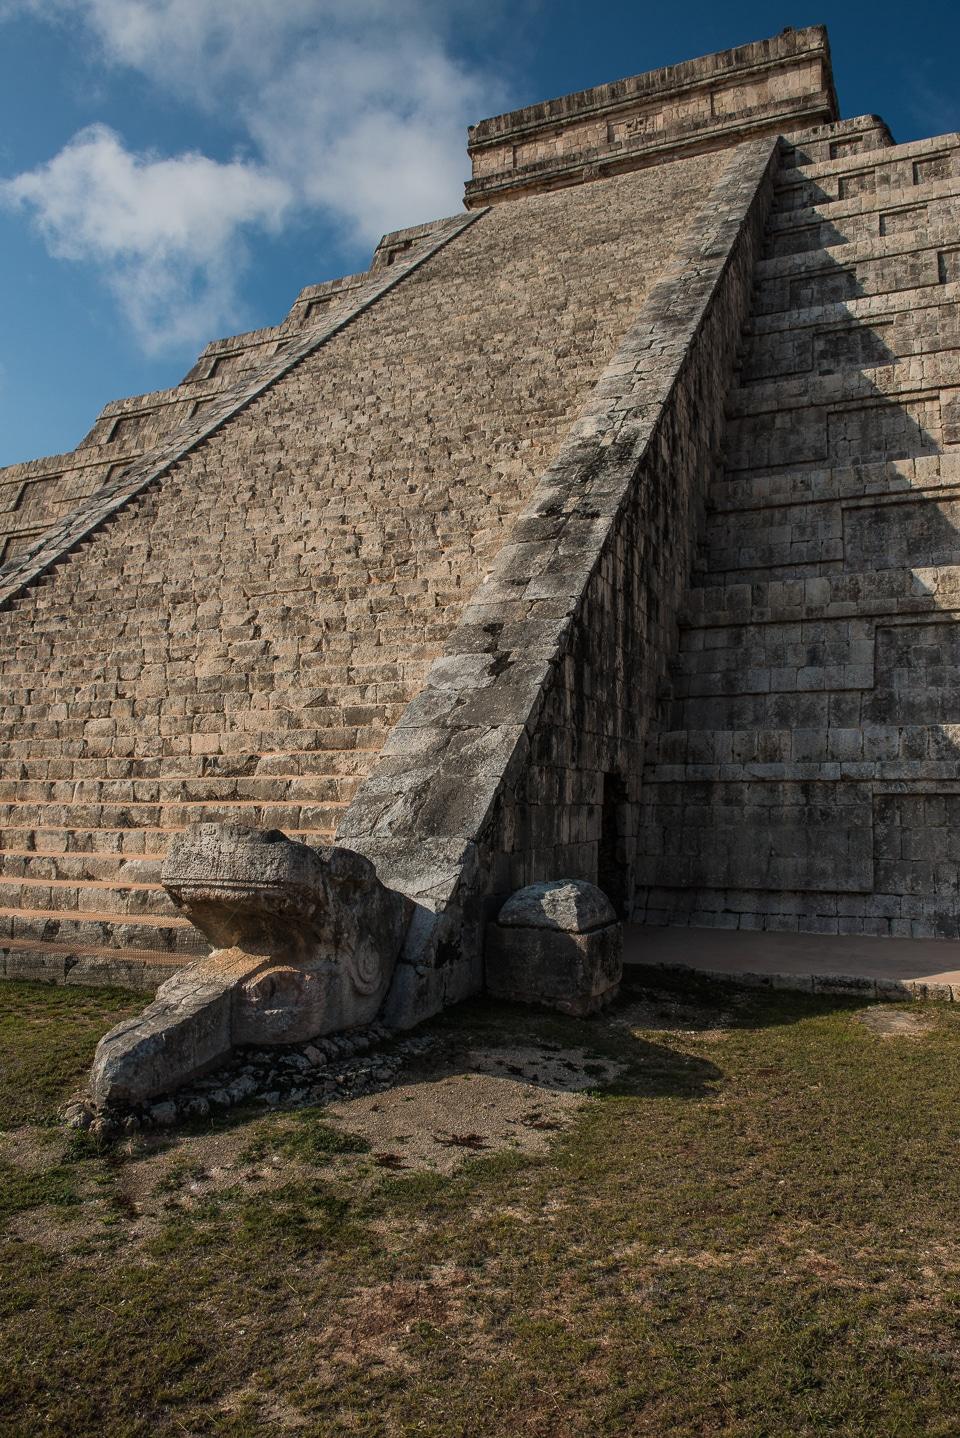 temple of kukulkán chichén itzá mexico travel past 50